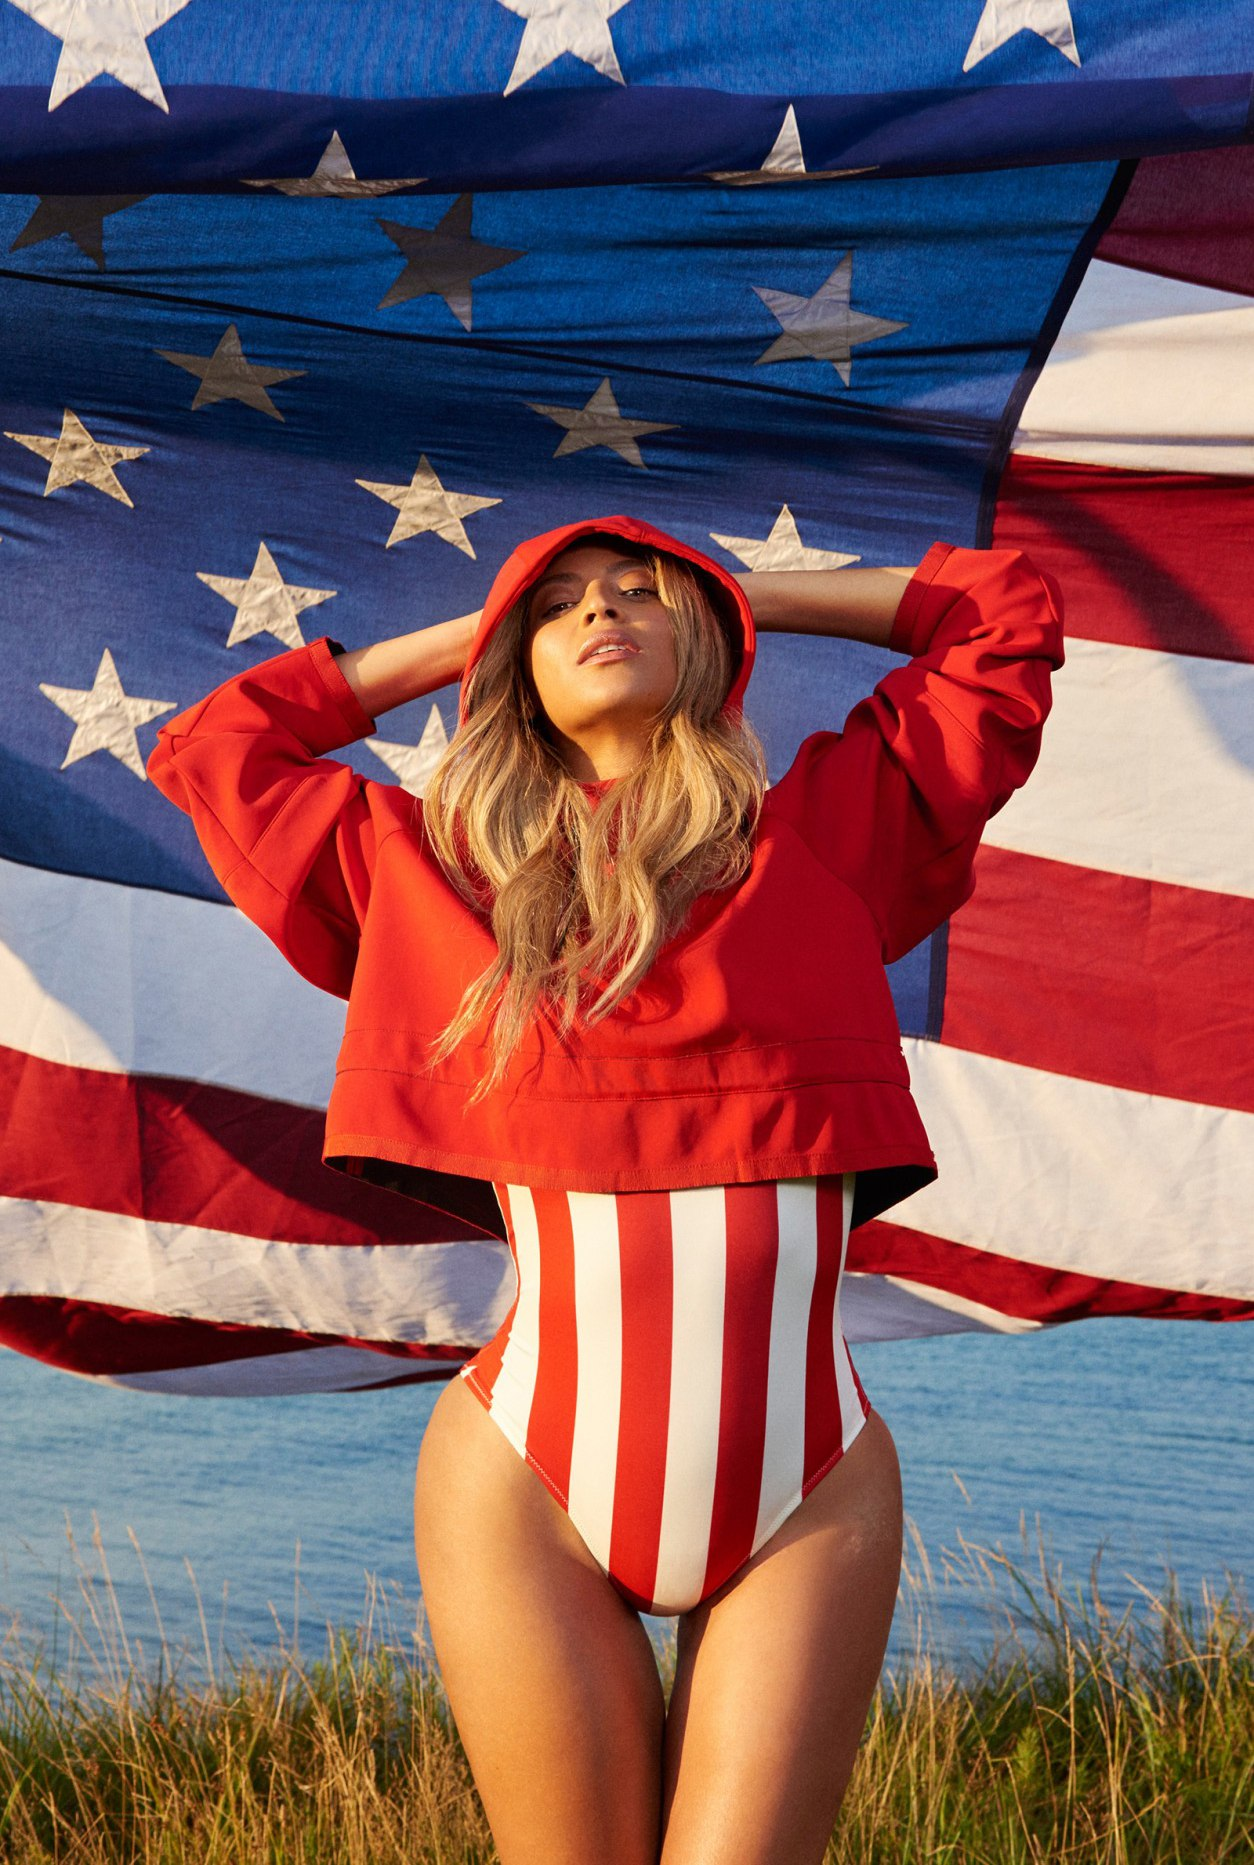 Beyonce-Sexy-10 (1)